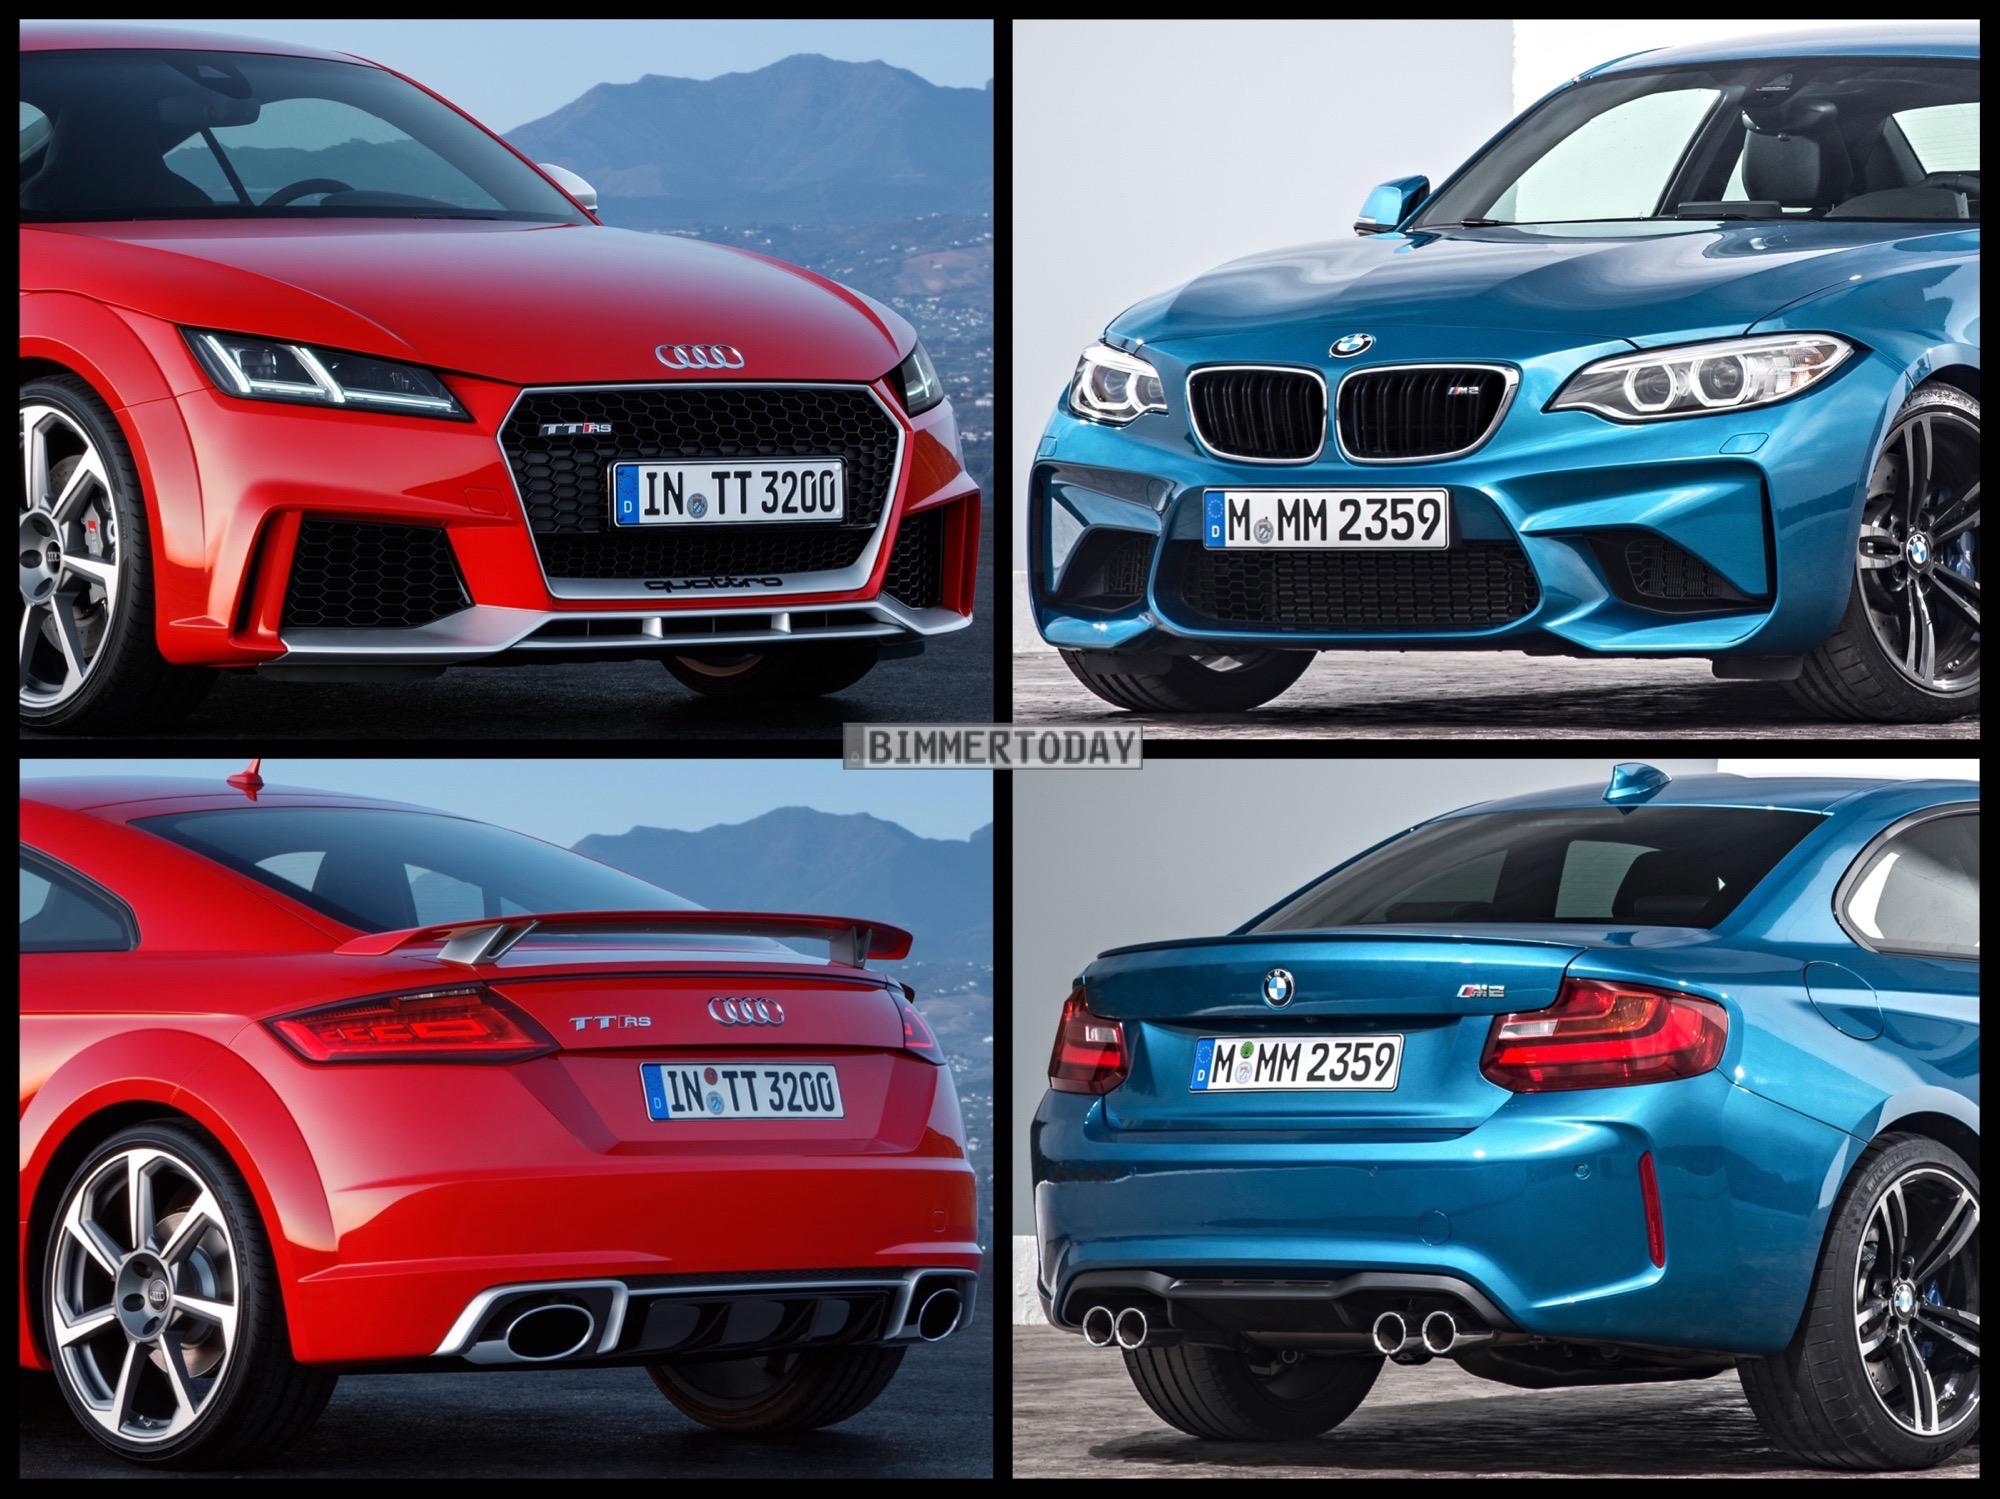 Bild Vergleich BMW M2 F87 Audi TT RS Coupe 2016 01